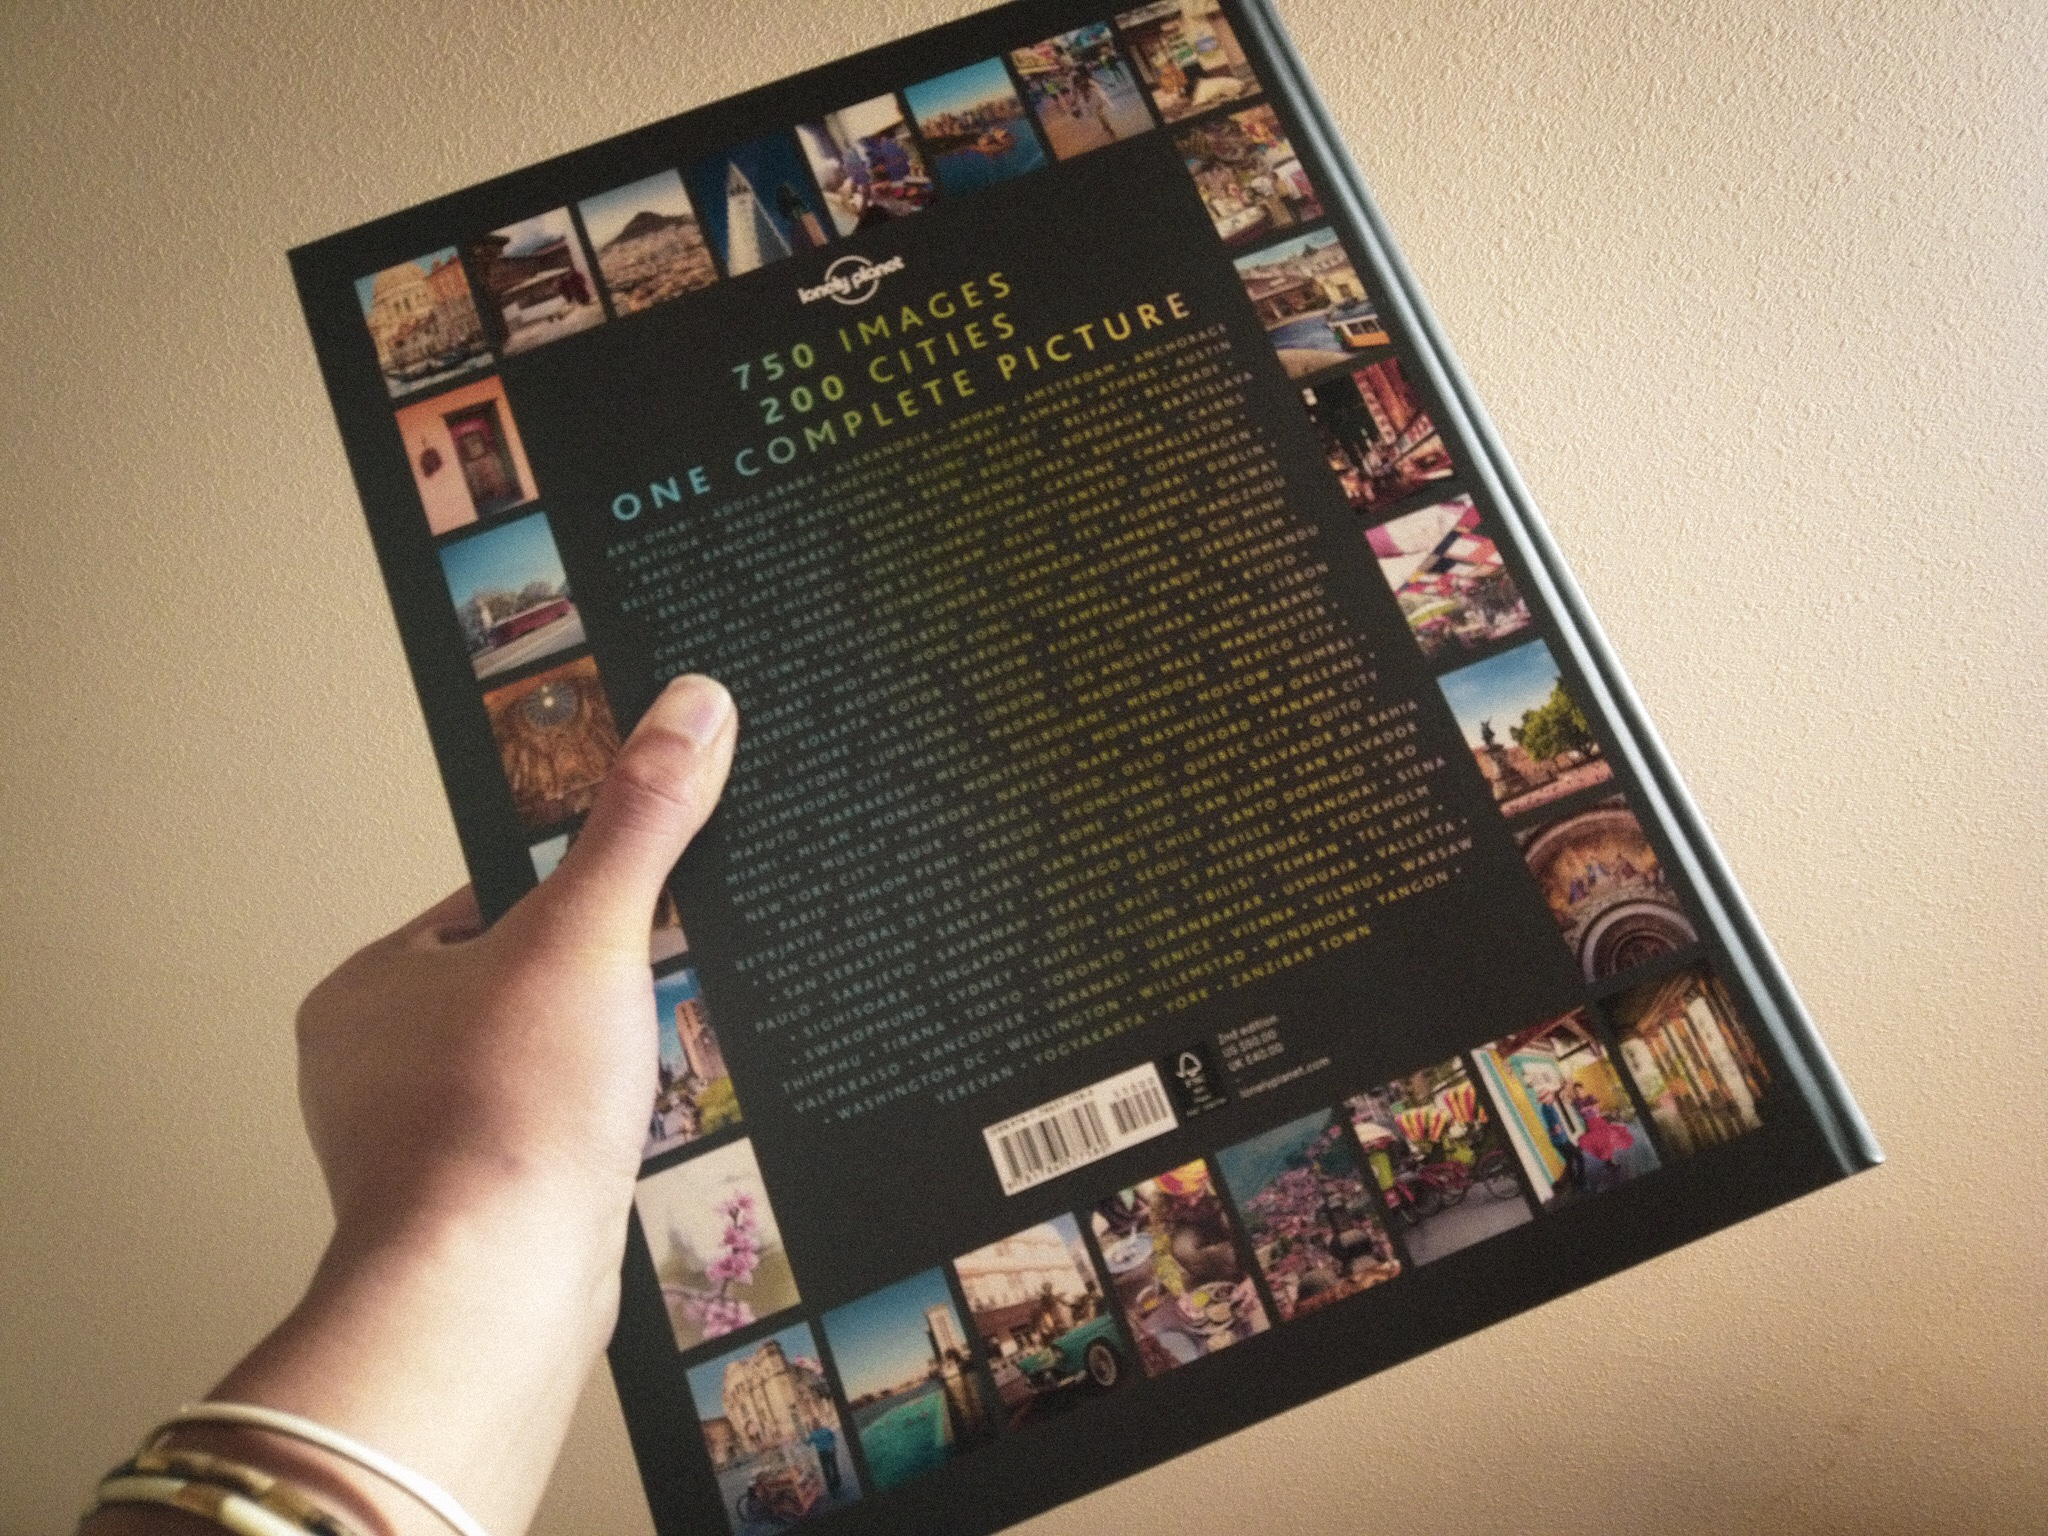 Lonely Planet賞の賞品「The Cities Book」届いた!Tokyo Tokyo Photo Awards ロンリープラネット賞受賞。余談だらけ:紙のモノ。写真・フォトコンテスト受賞履歴2018-2019